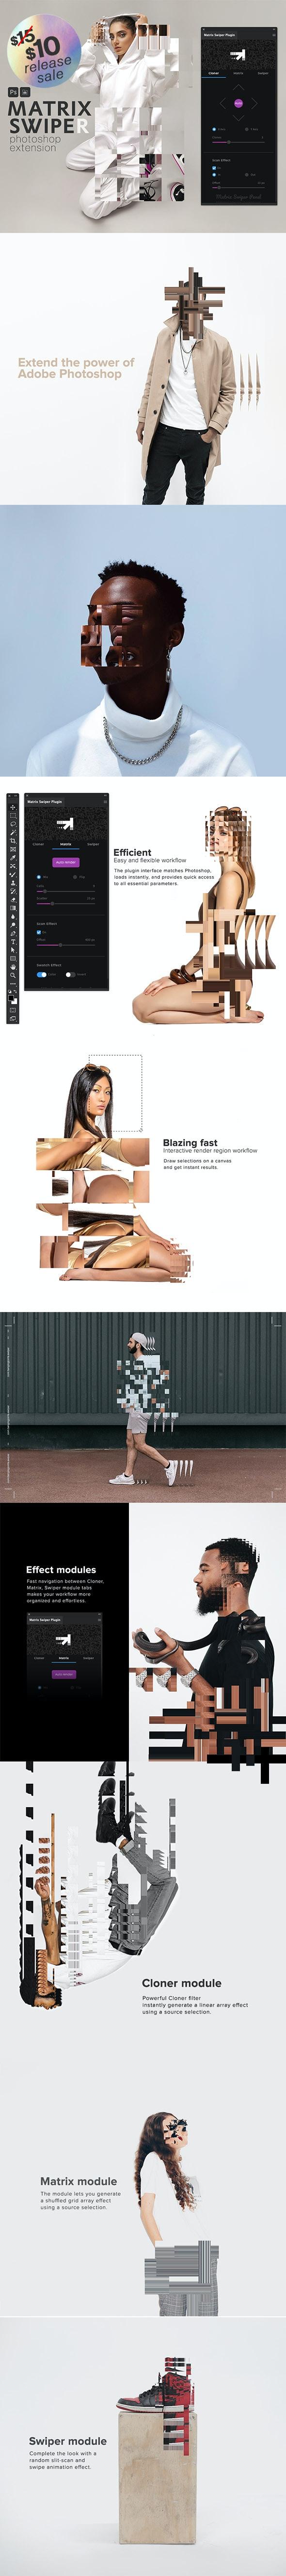 Matrix Swiper - Animation Photoshop Plugin - Photo Effects Actions